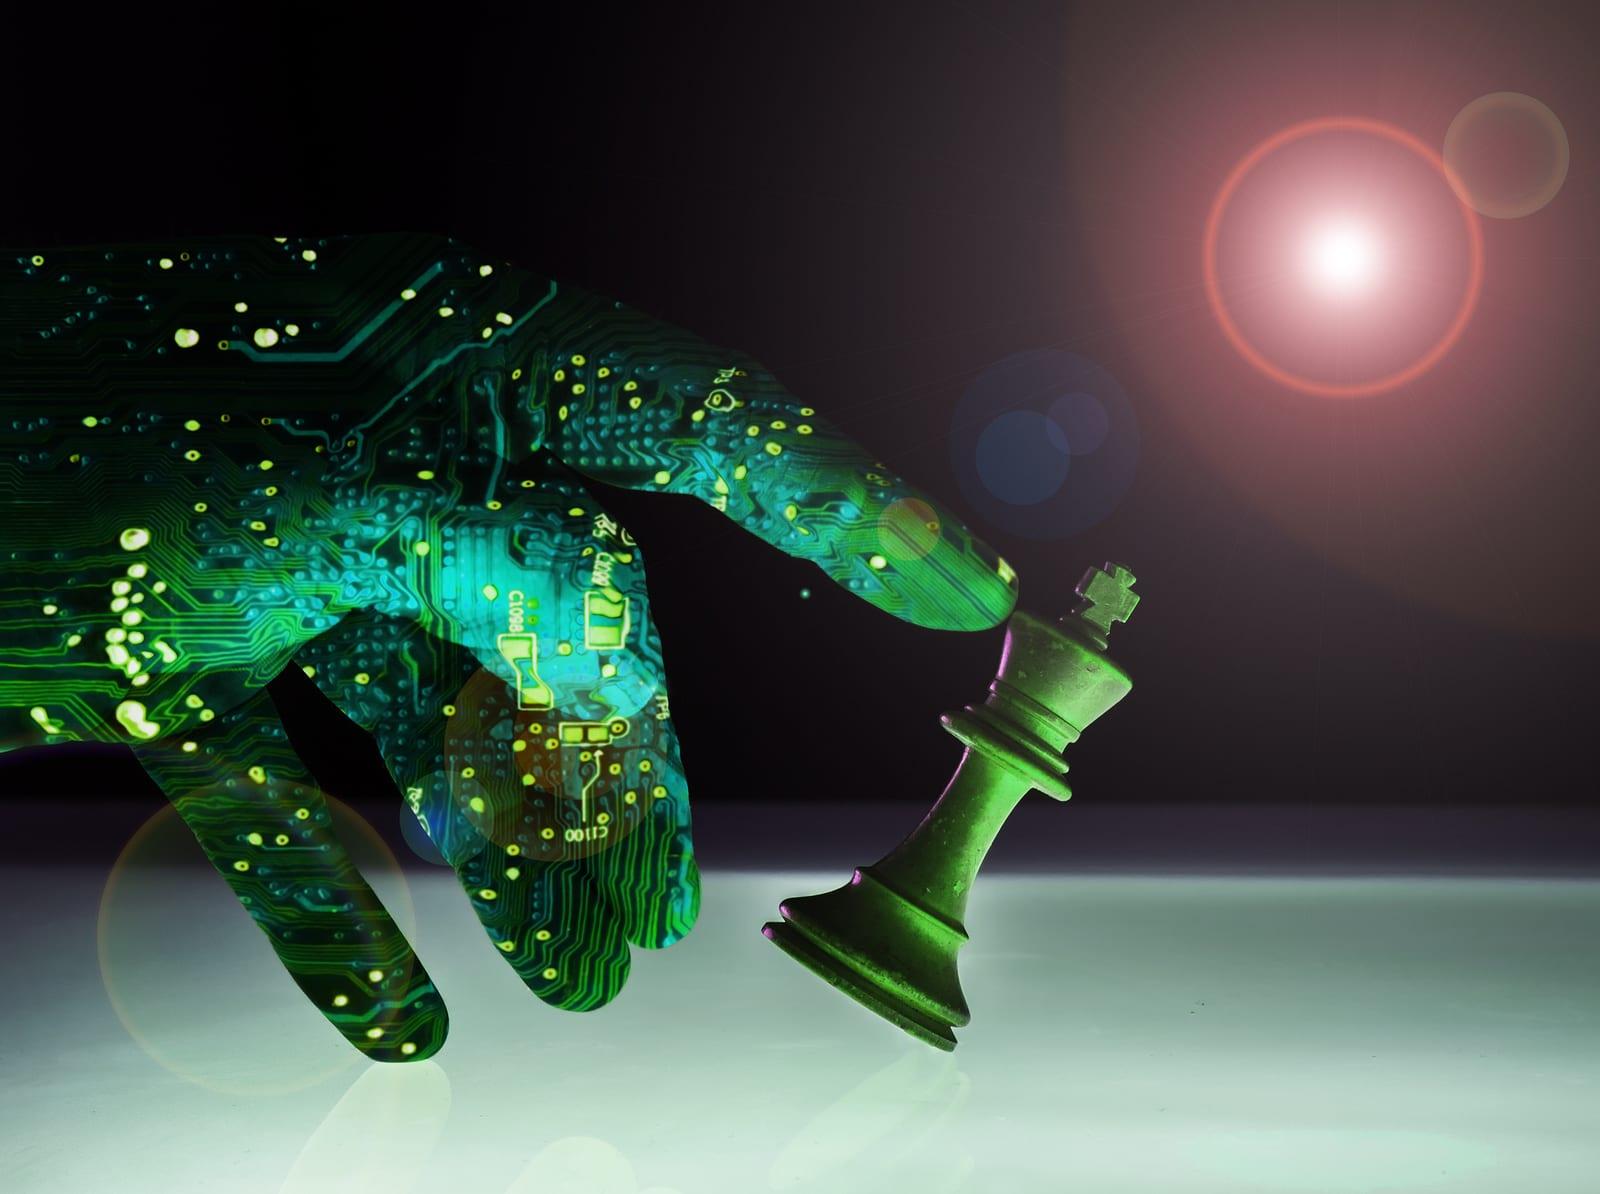 Artificial Narrow Intelligence vs Artificial General Intelligence